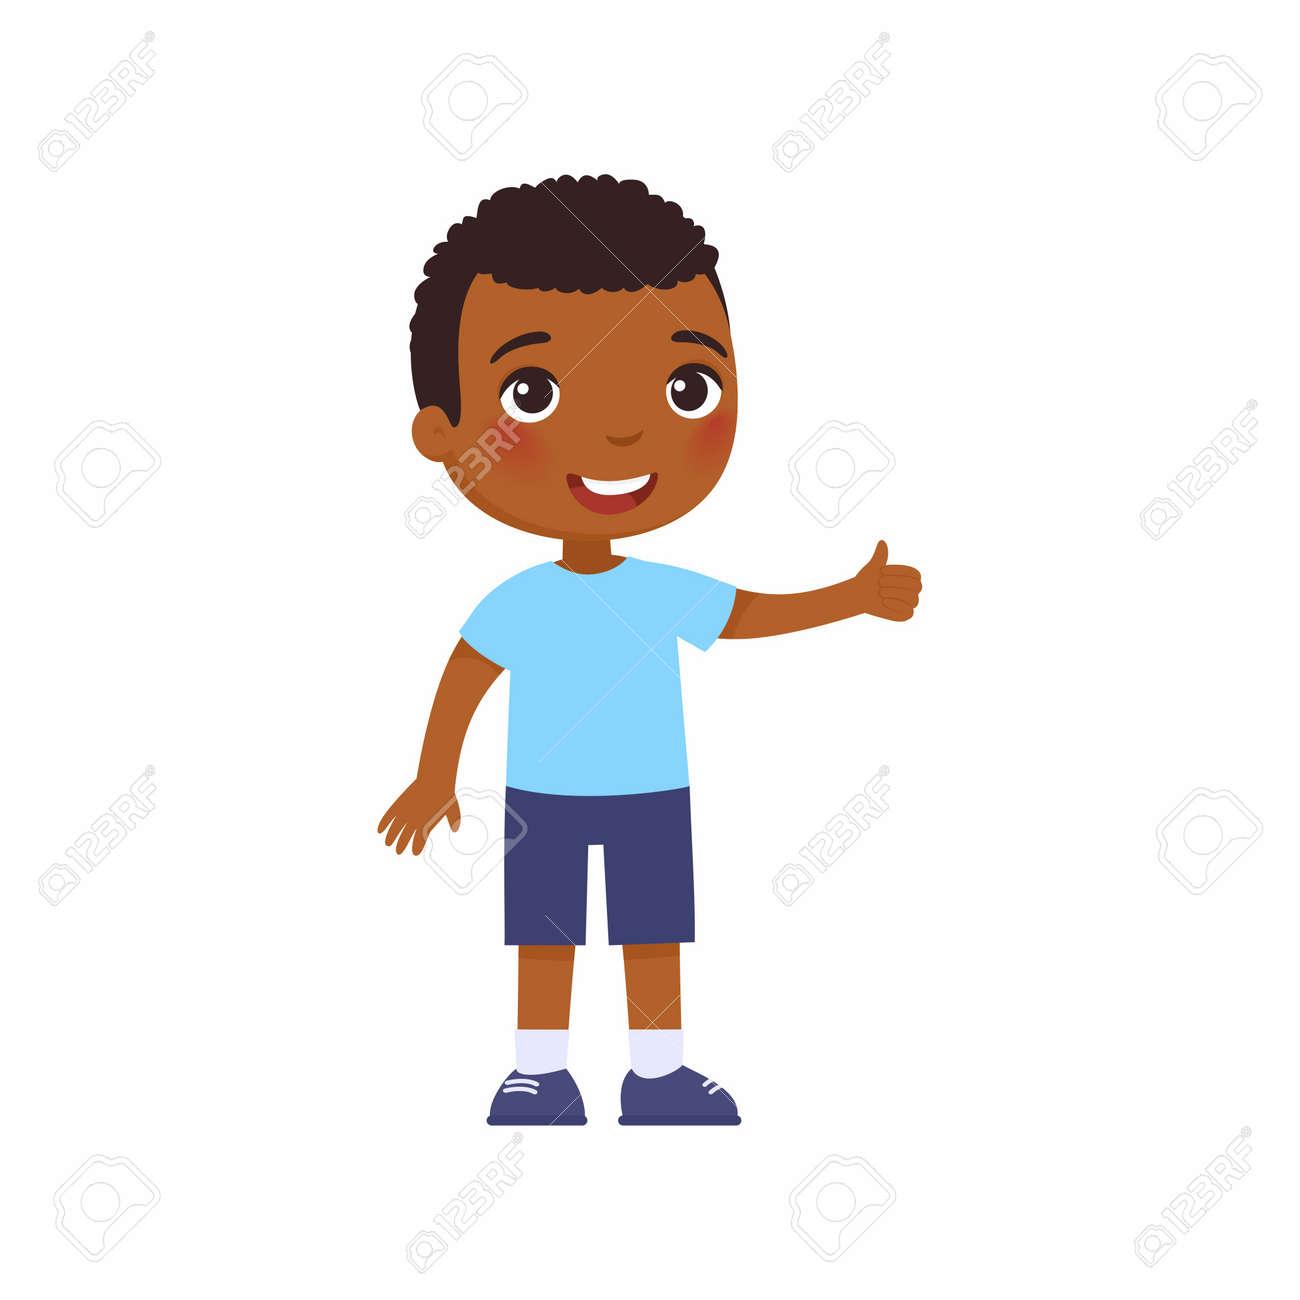 Cute African boy showing thumbs up gesture. Happy little kid, Smiling dark skin toddler, preteen child cartoon character - 170452511